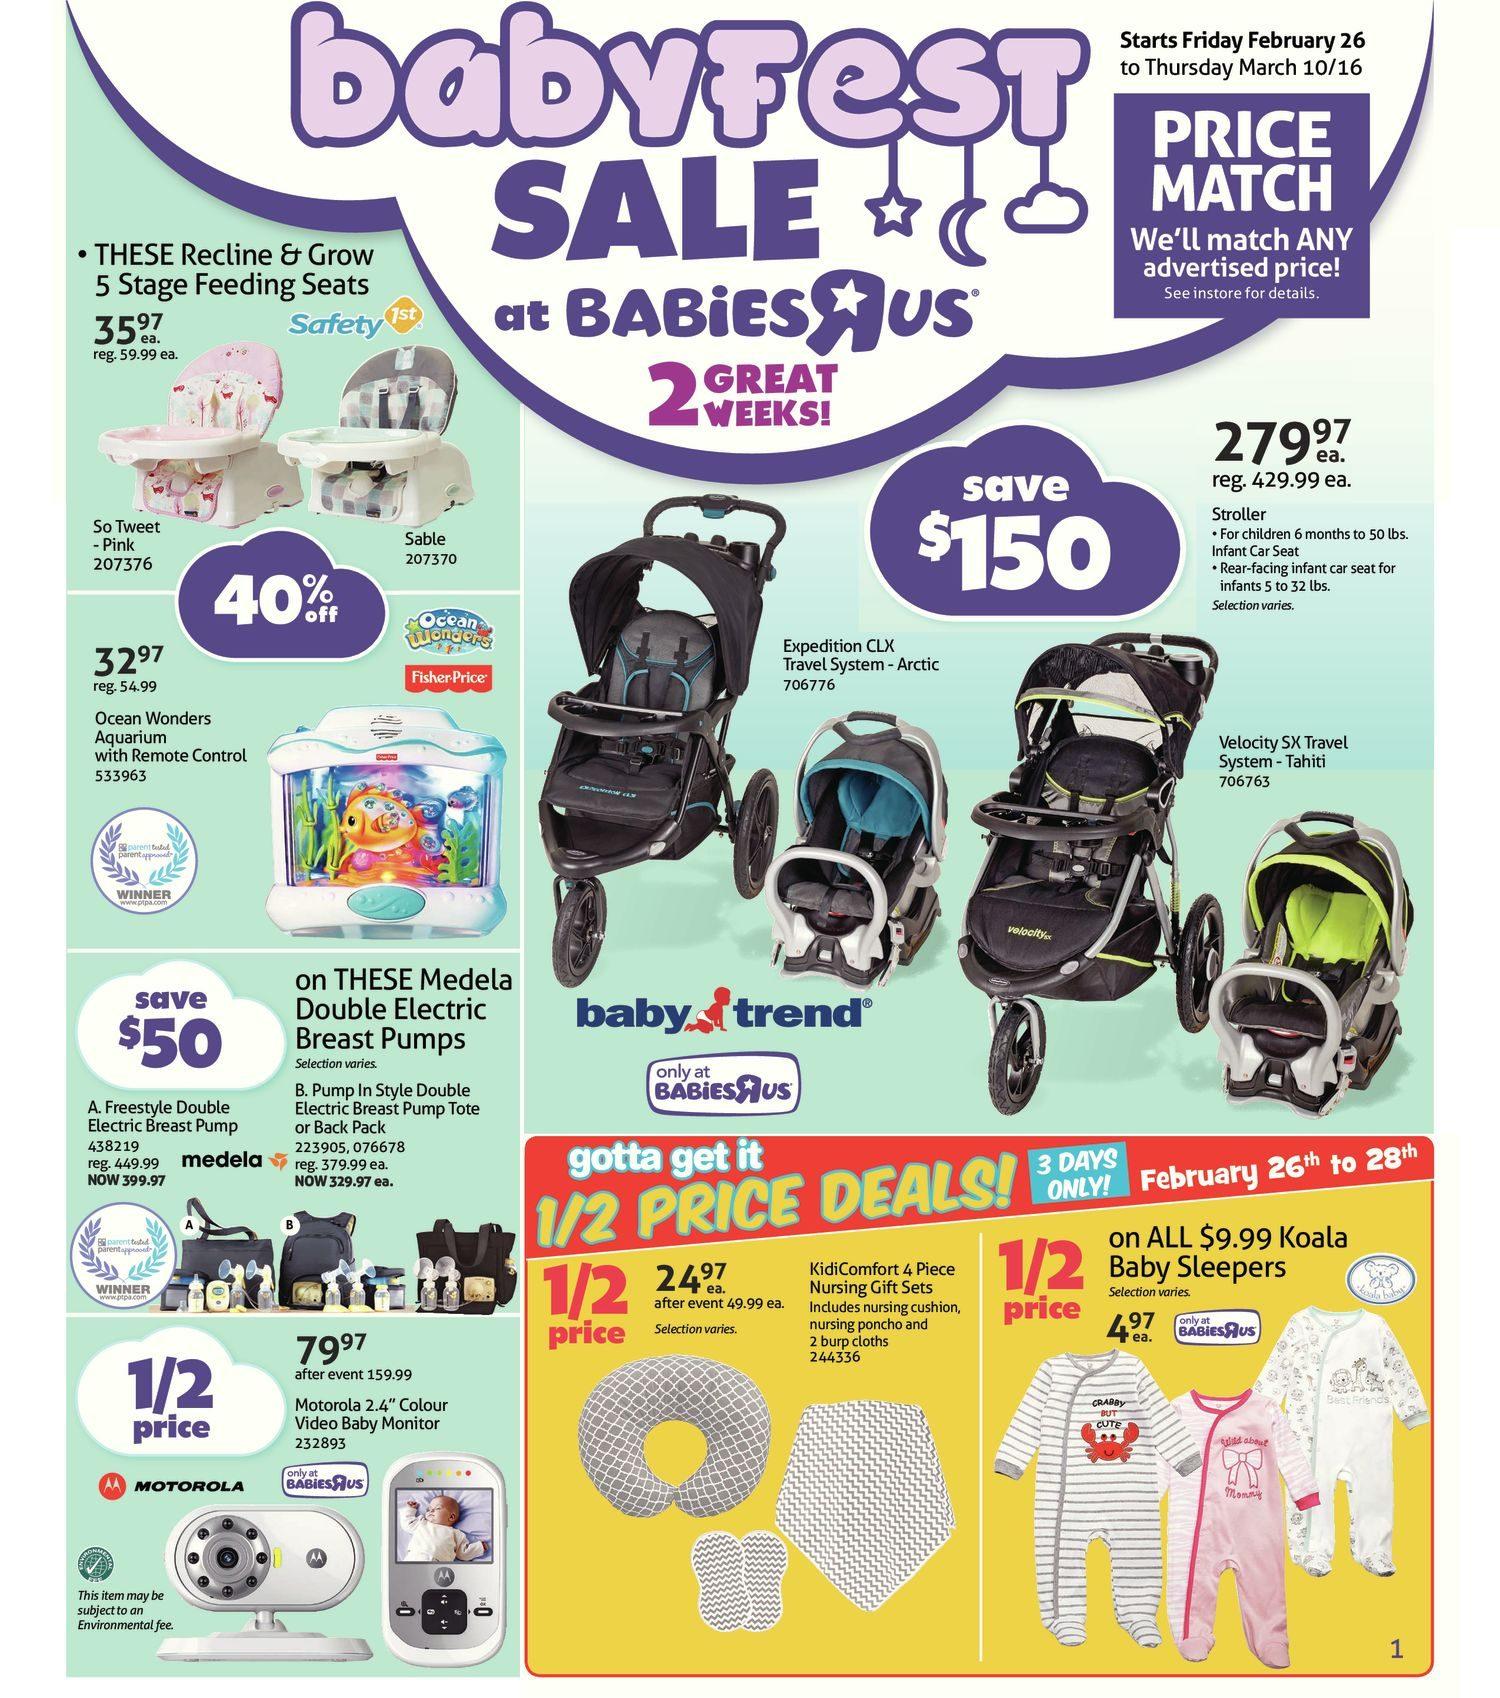 Babies R Us Weekly Flyer 2 Great Weeks Babyfest Sale Feb 26 Bright Starts Ingenuity Smartbounce Automatic Bouncer Winslow Mar 10